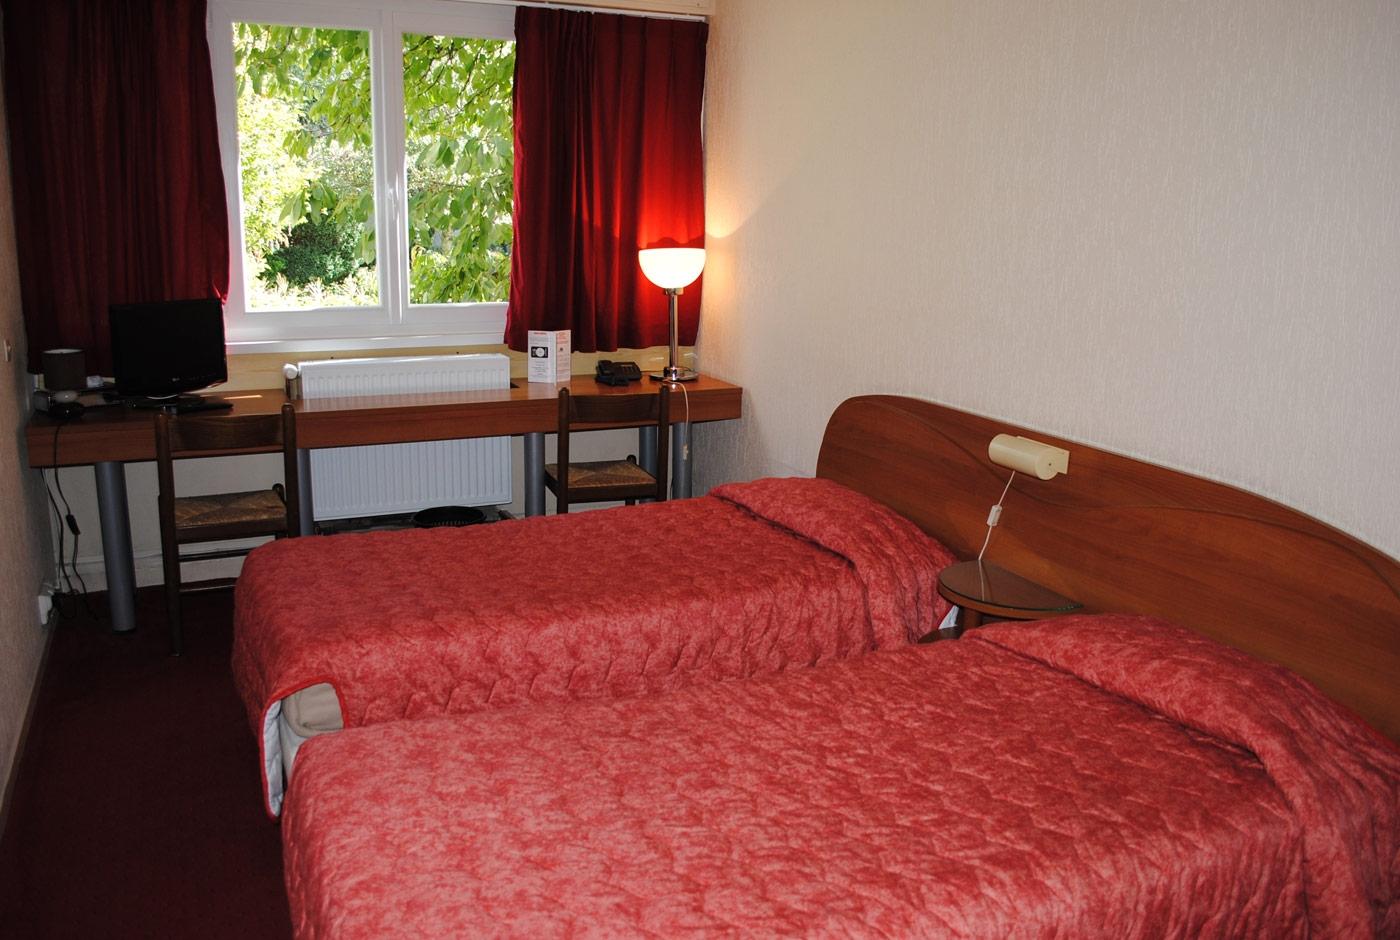 hotel-lacassagne-home-slide10